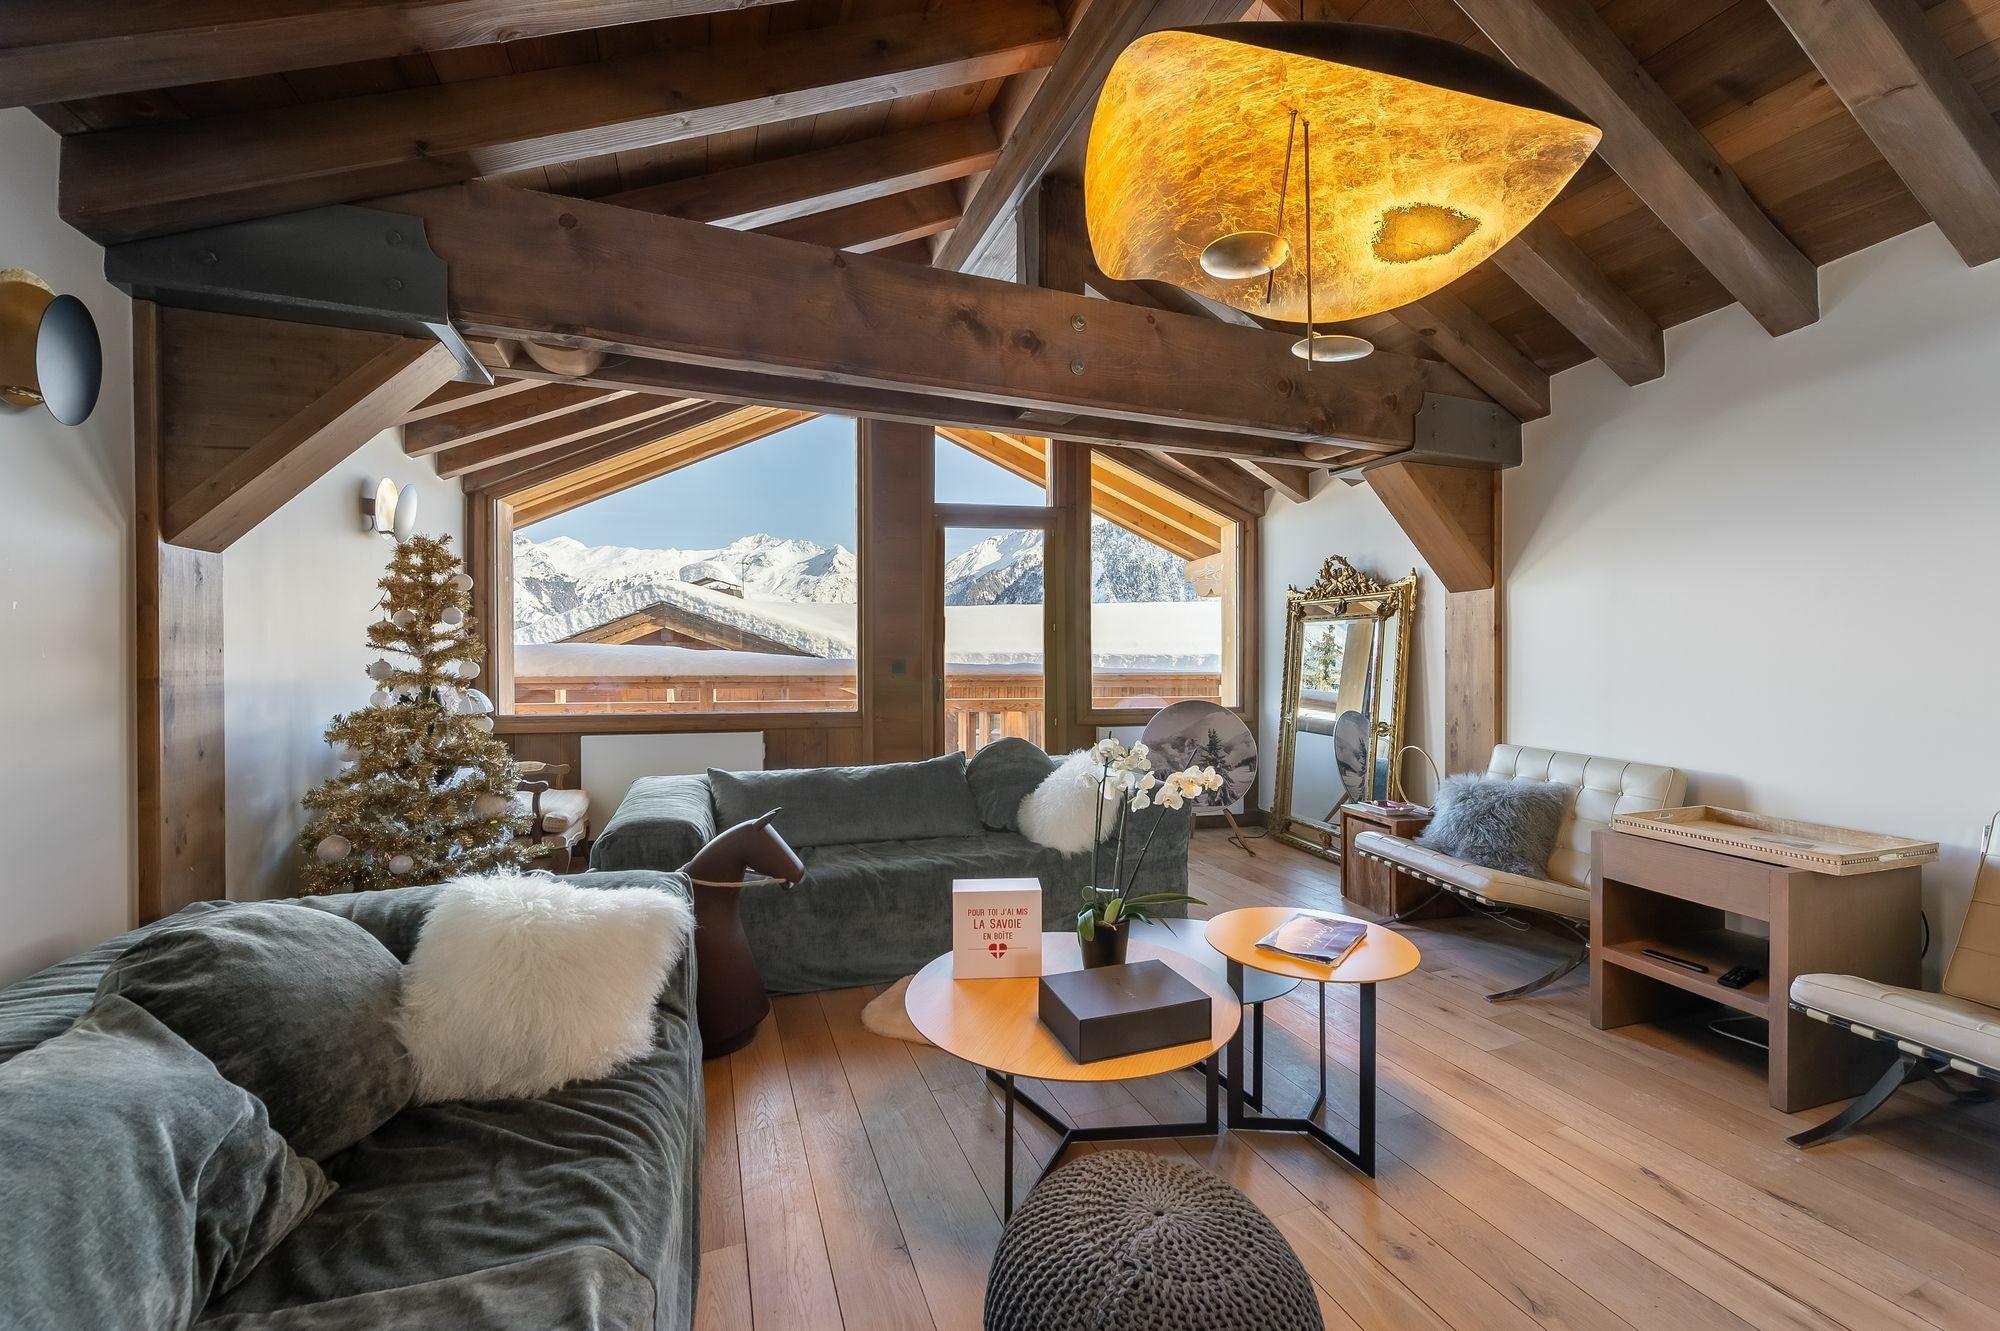 PROSPER Accommodation in Courchevel